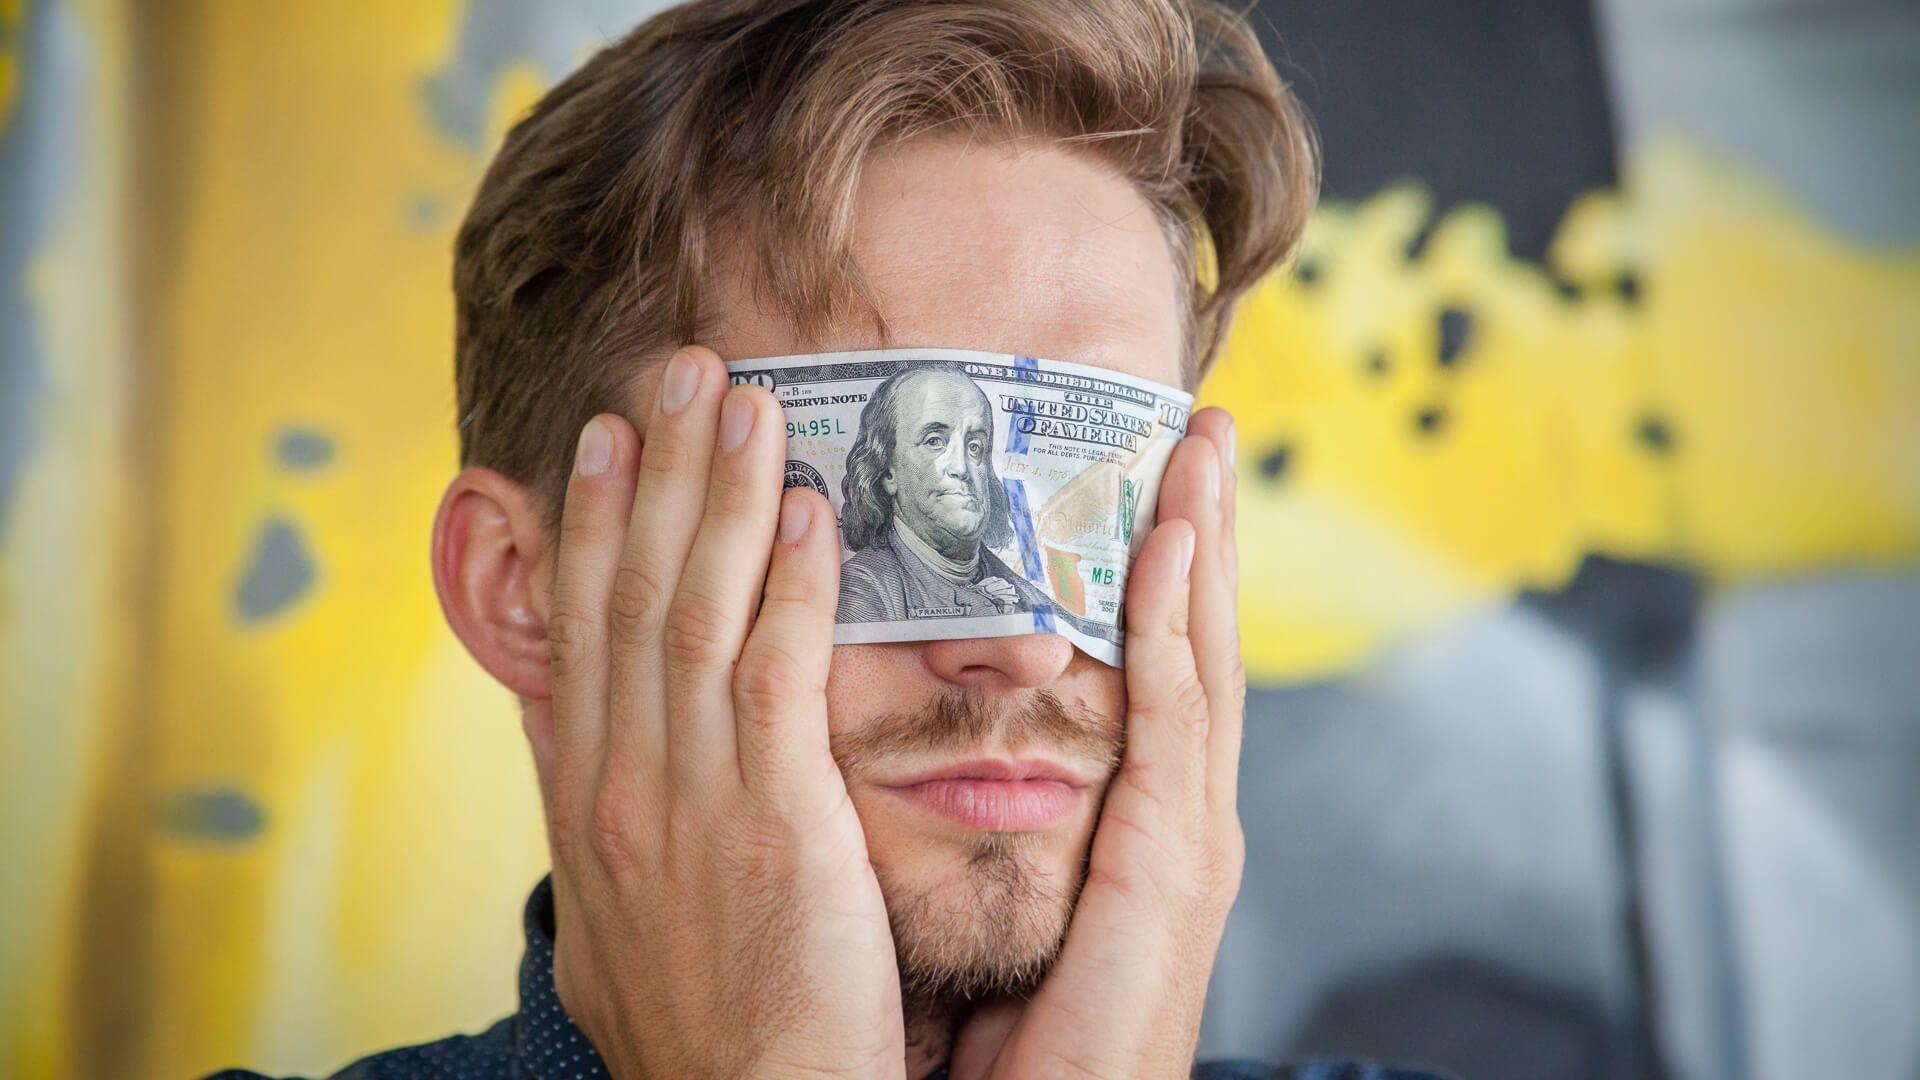 Man blindfolds eyes with 100 dollar bill